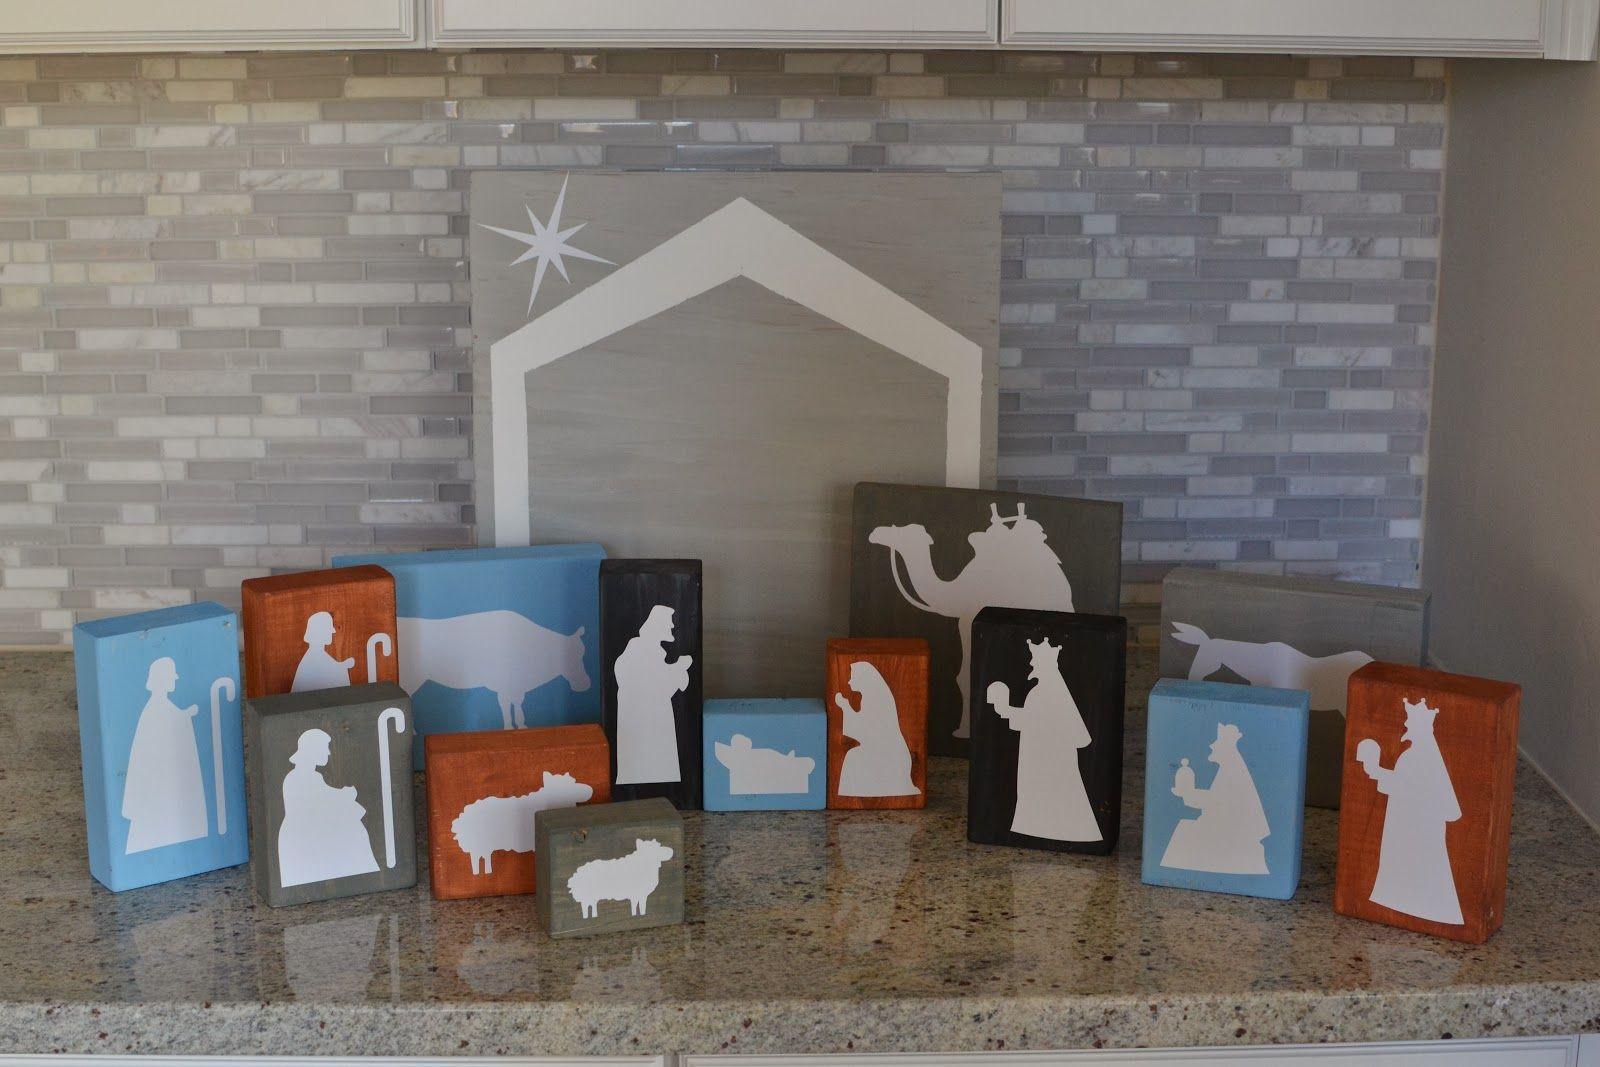 DIY Wood Block Nativity Set Diy nativity, Nativity set